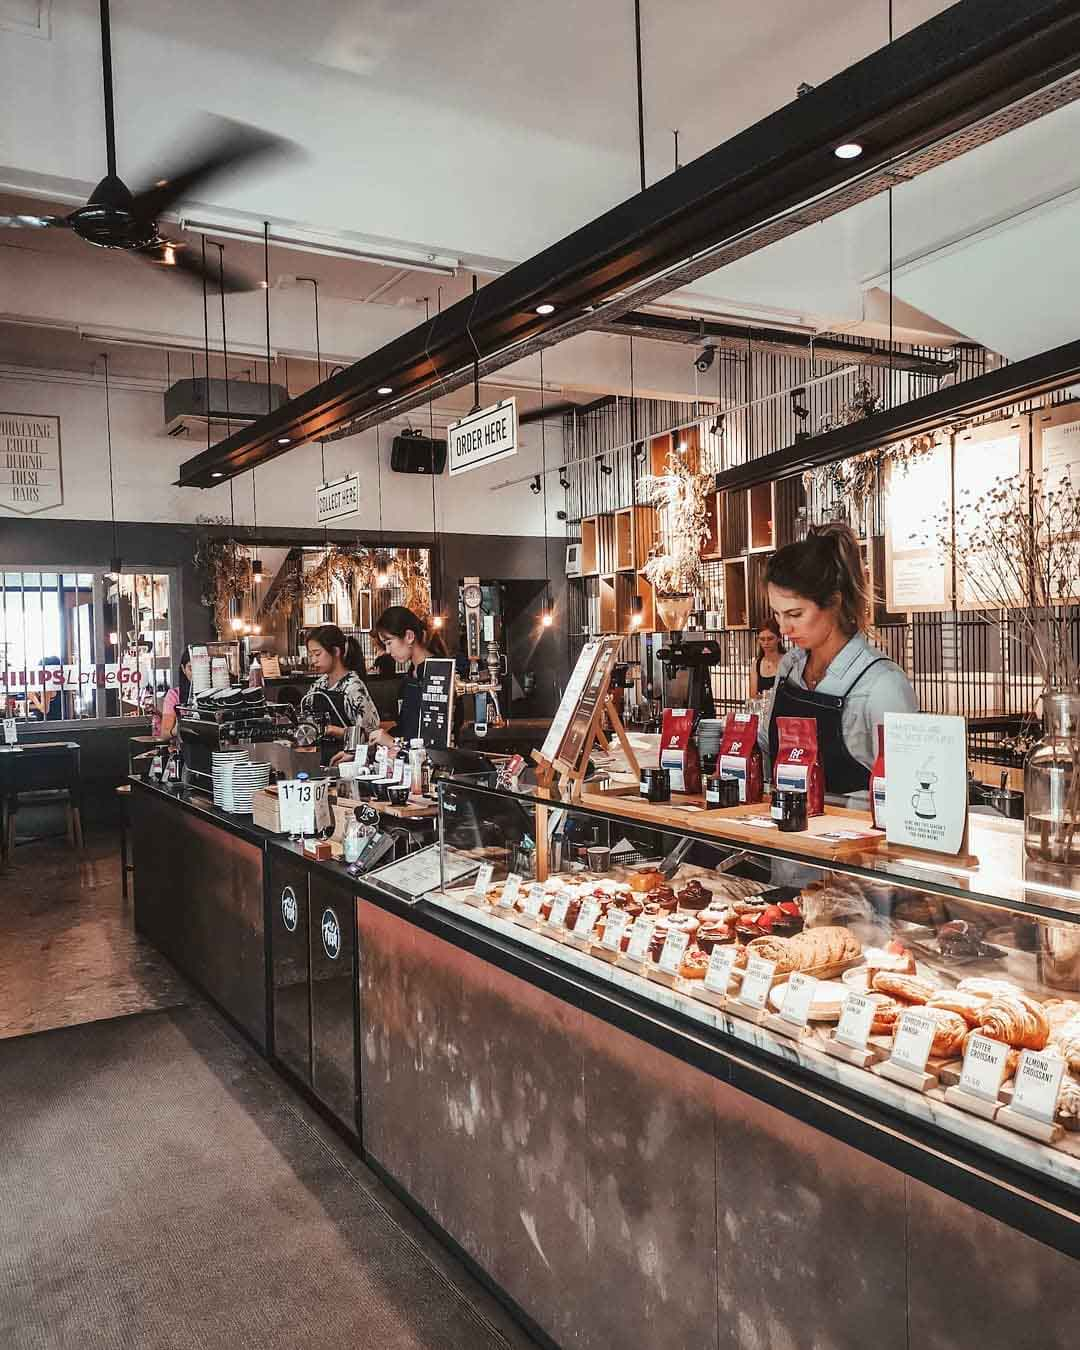 Coffee Cafes Singapore - Chye Seng Huat Hardware Coffee